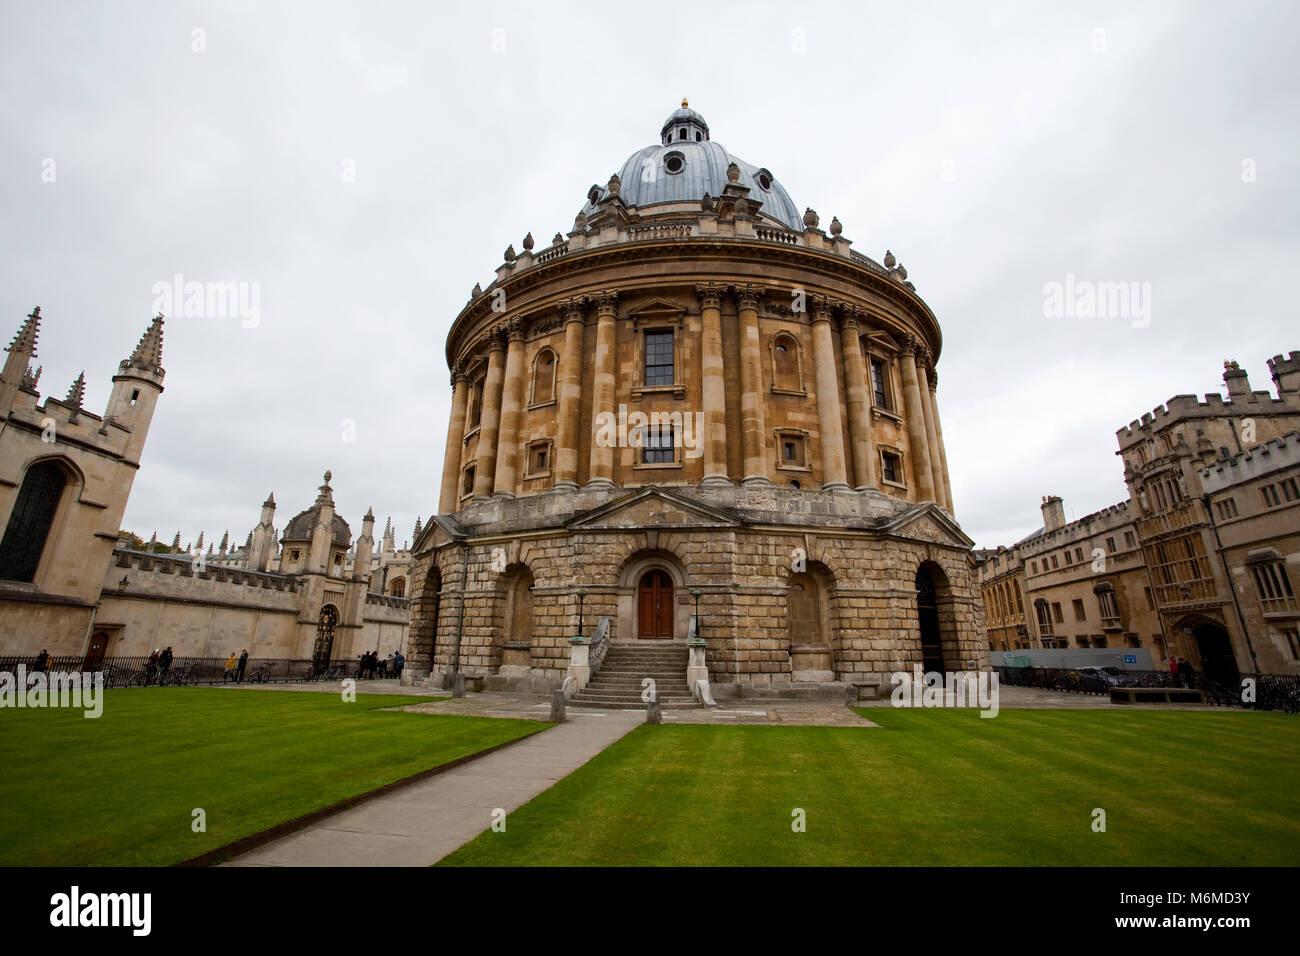 Oxford University reading room - Stock Image